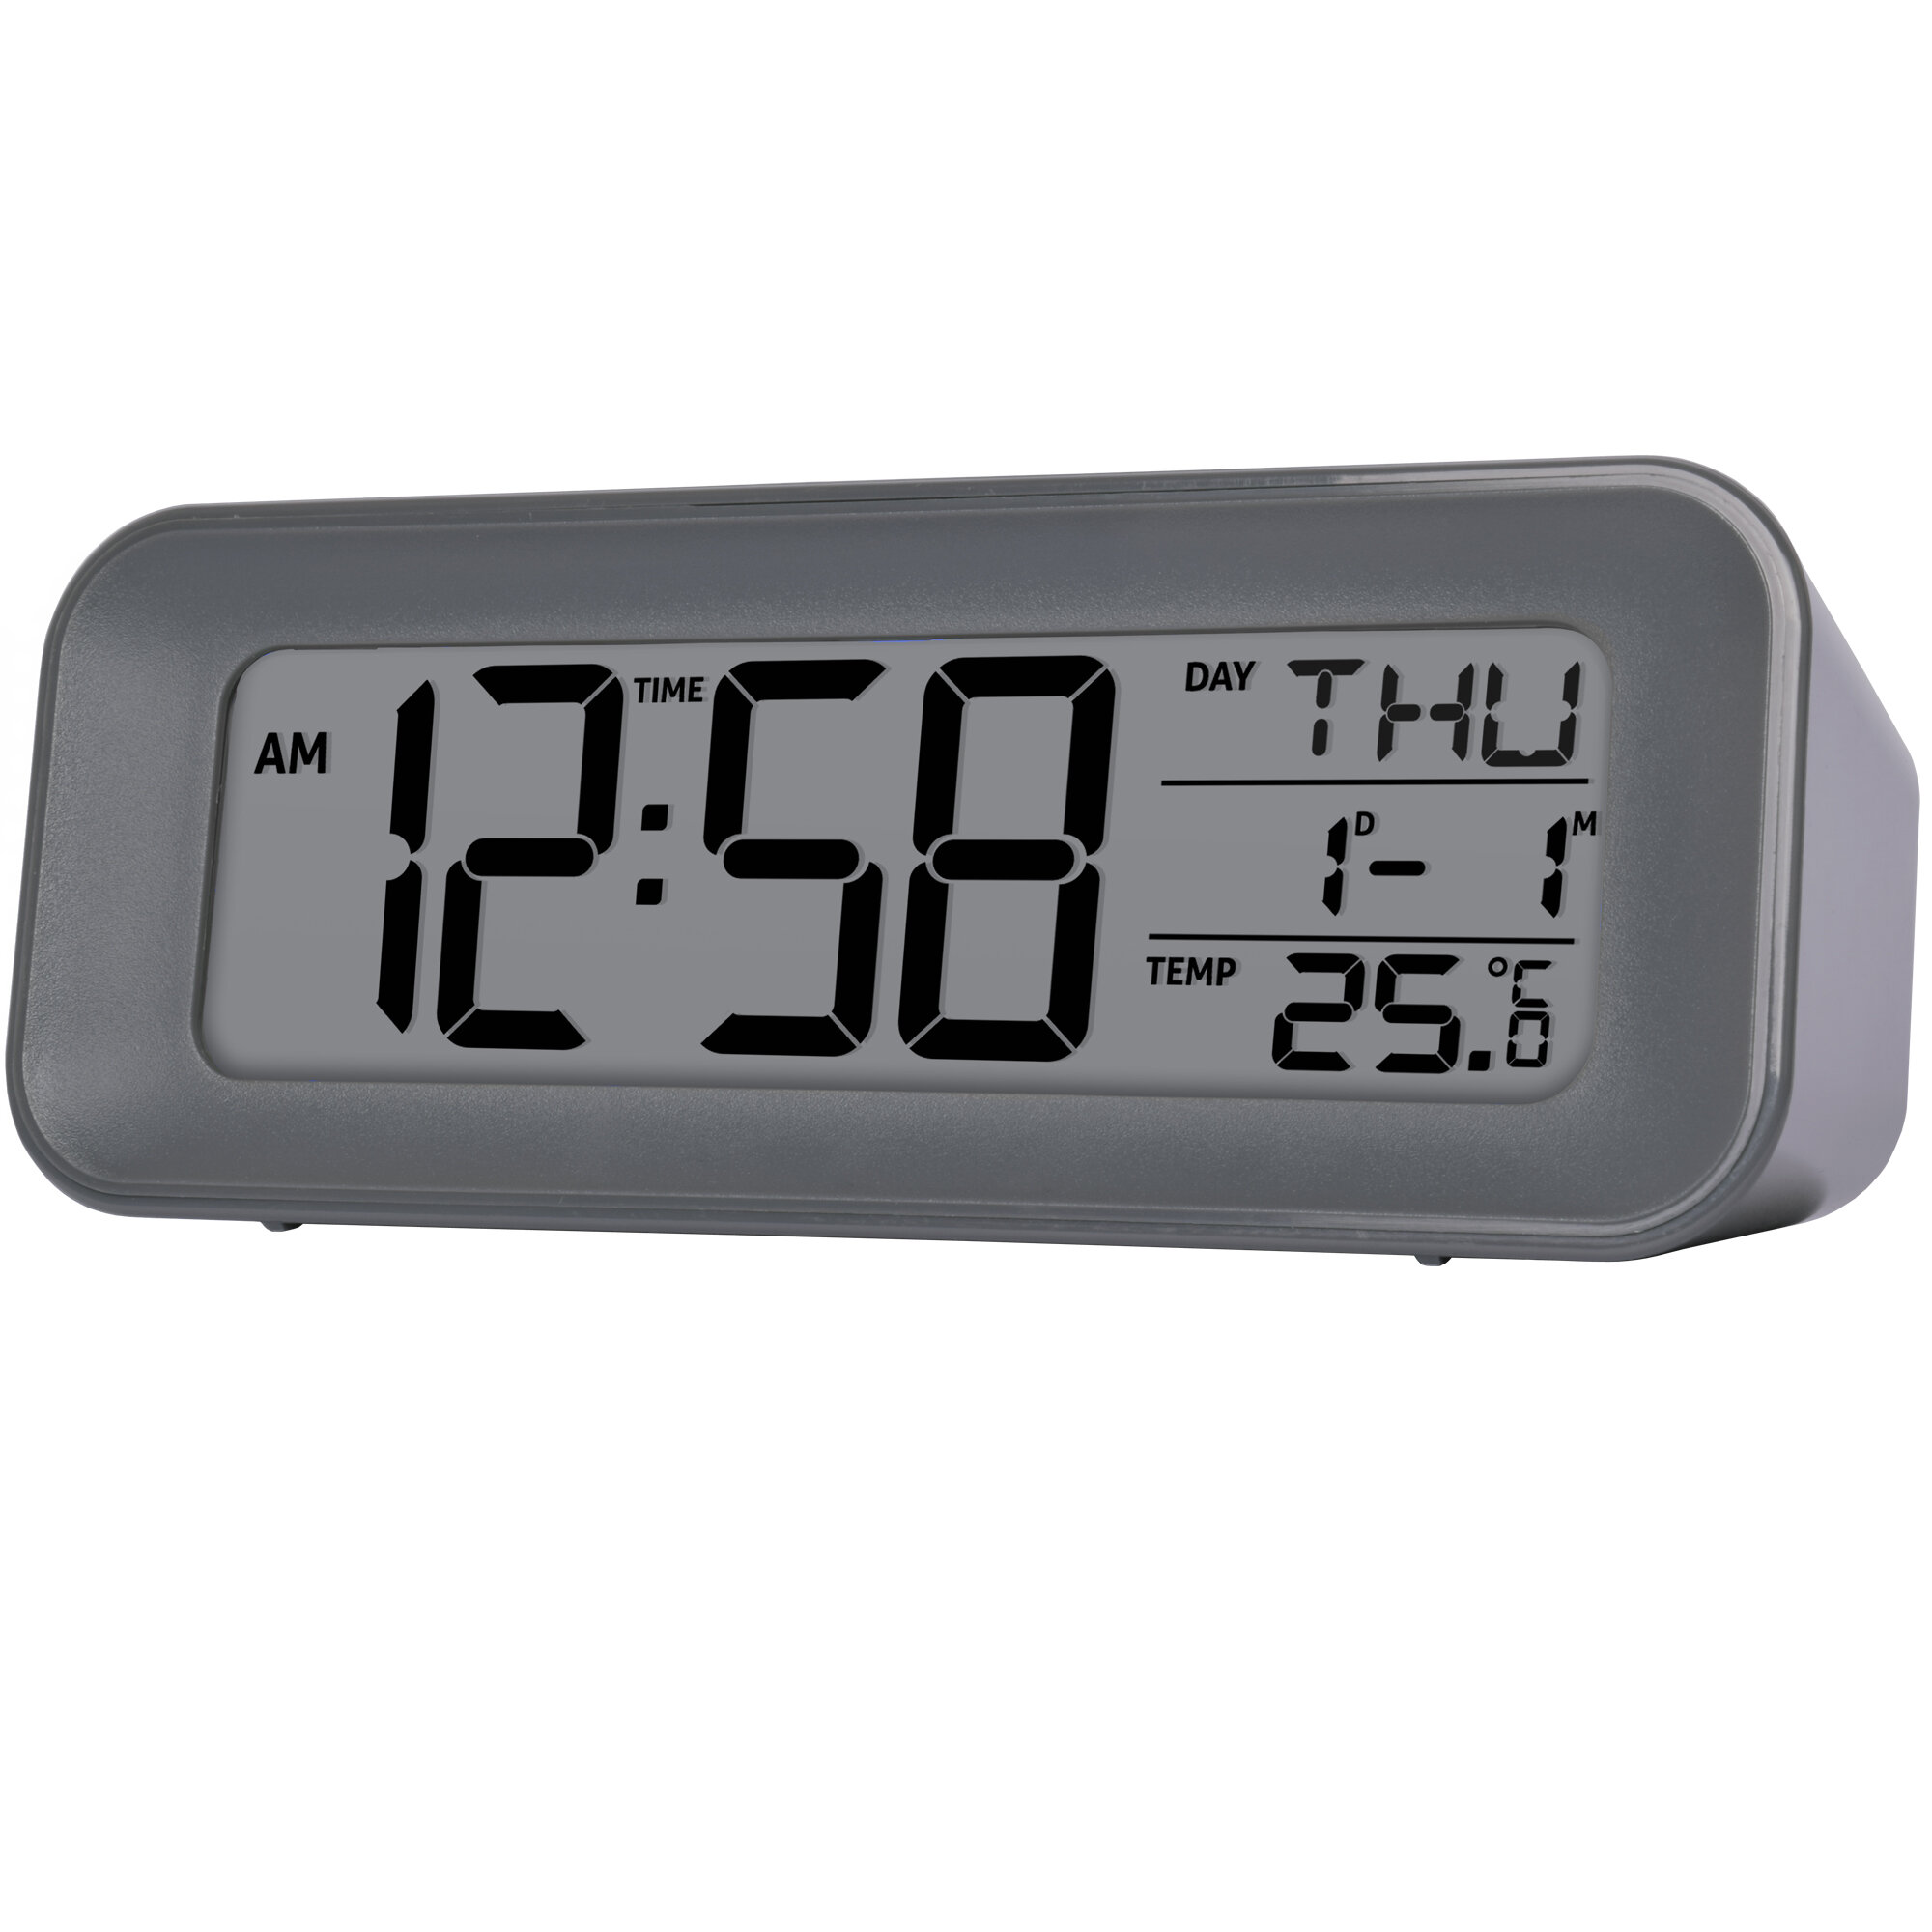 Mechanical Alarm Clock Retro Desktop Clock Round Metal Double Bell Desk Table Digital Clock Modern Home Decor Firm In Structure Home & Garden